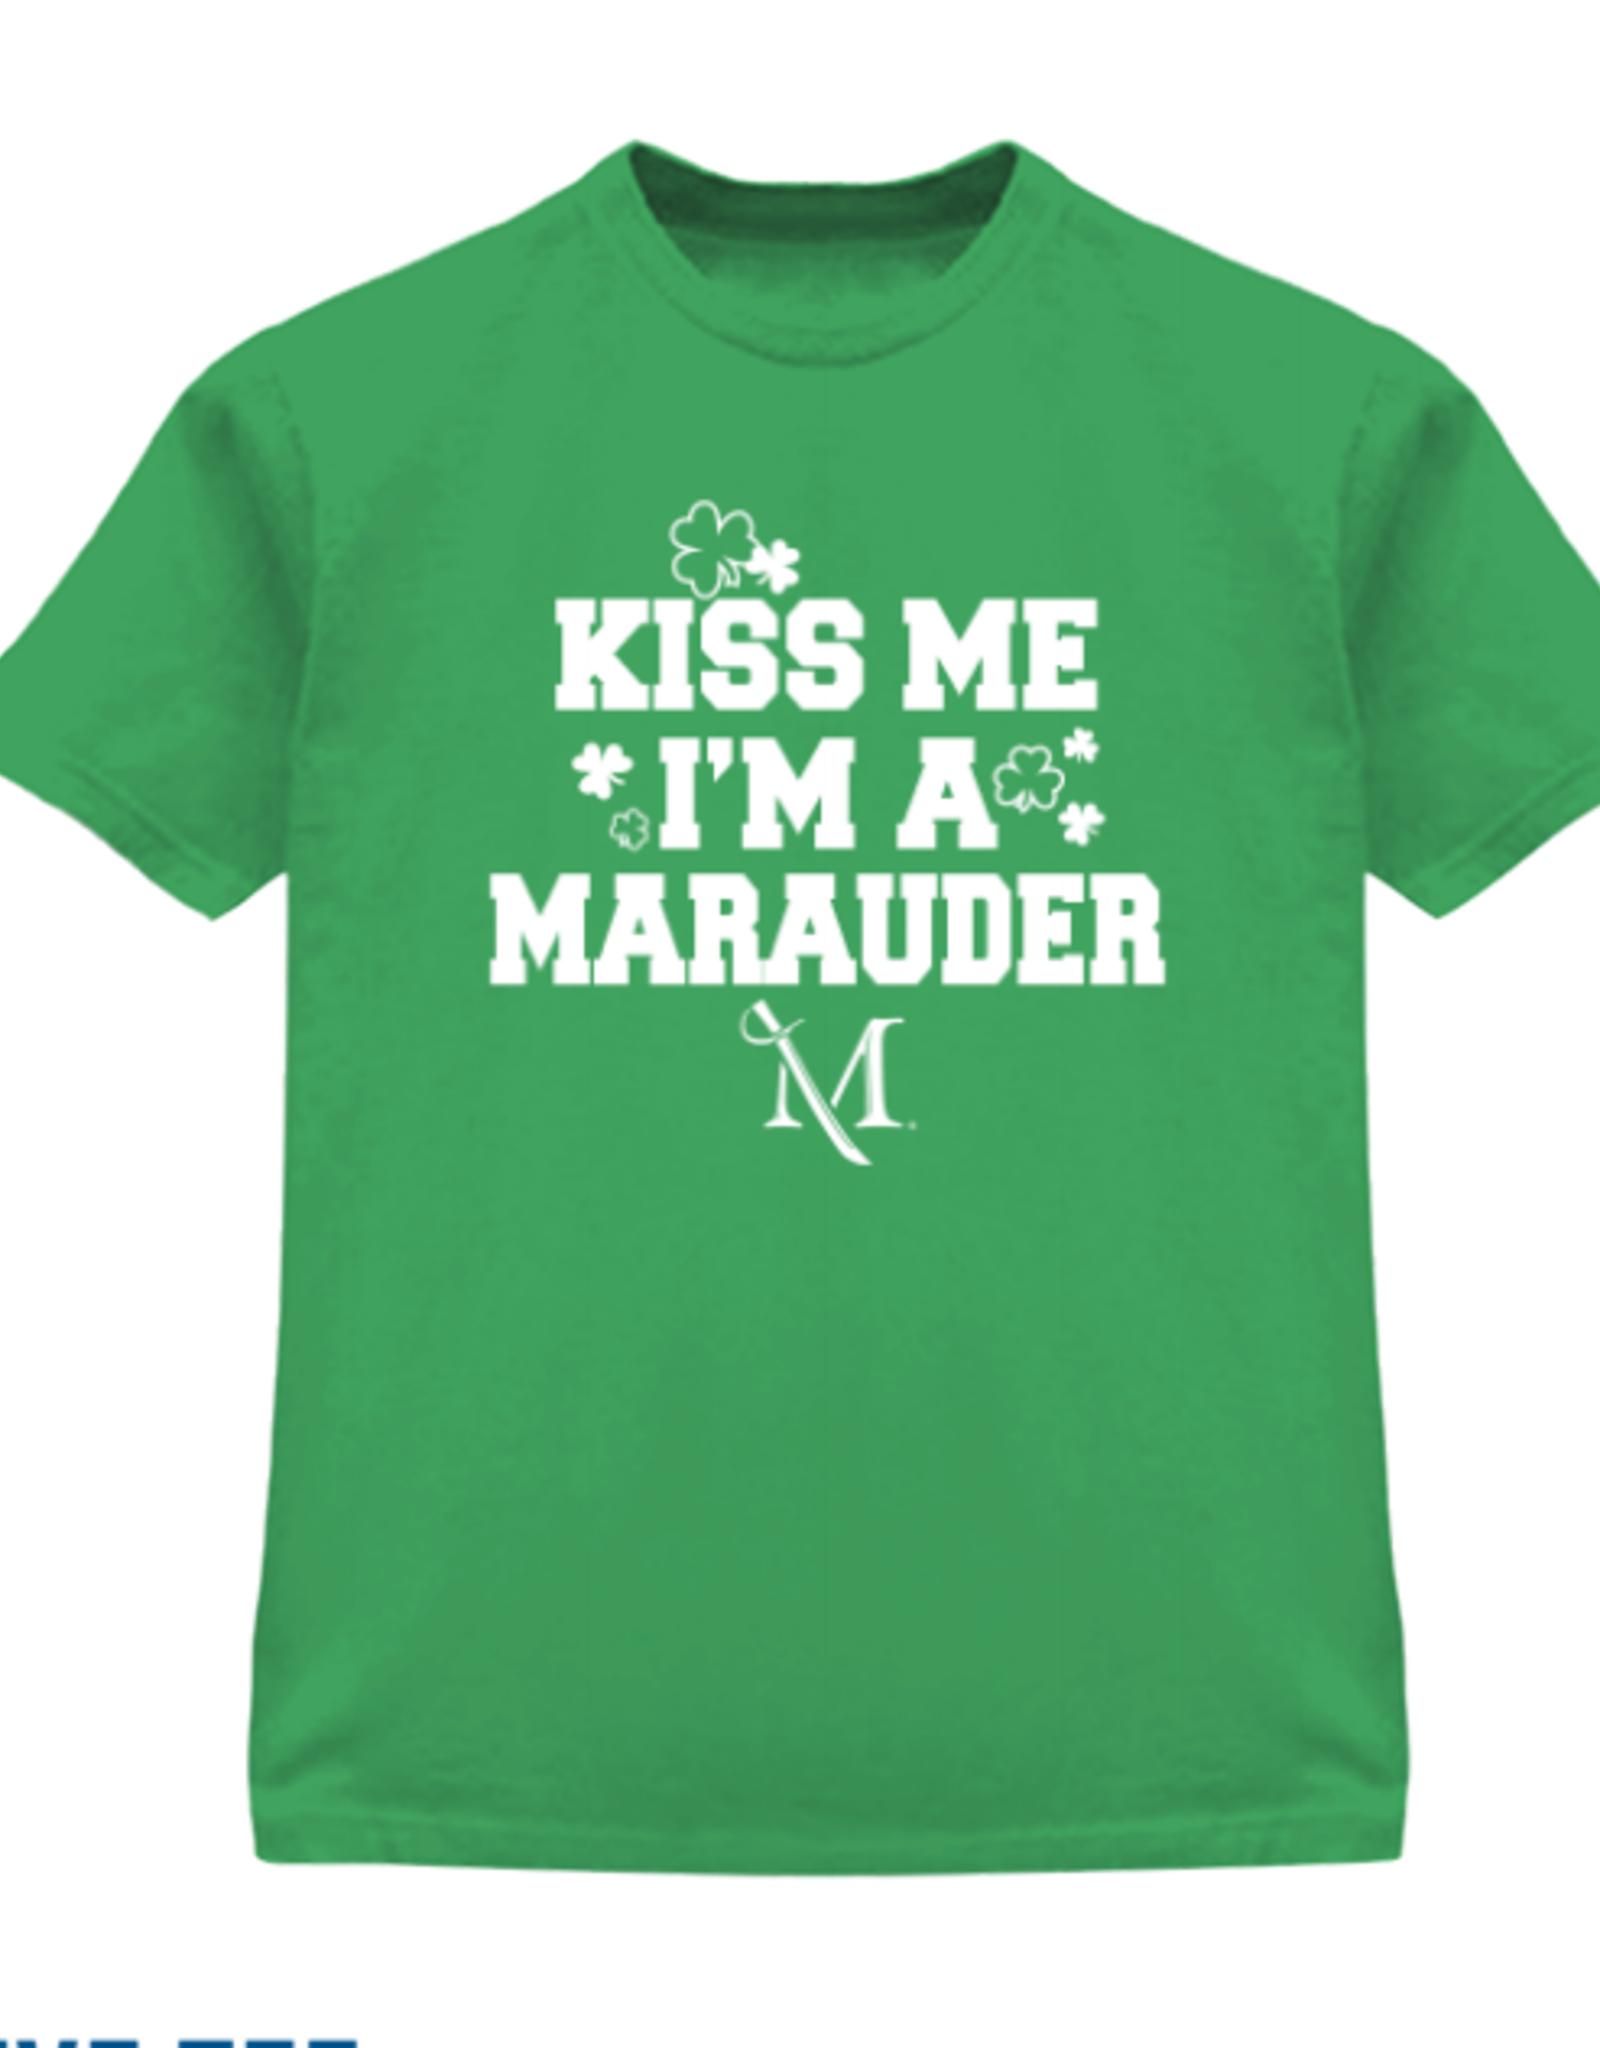 """Kiss Me, I'm A Marauder"" Tee - Sale!"